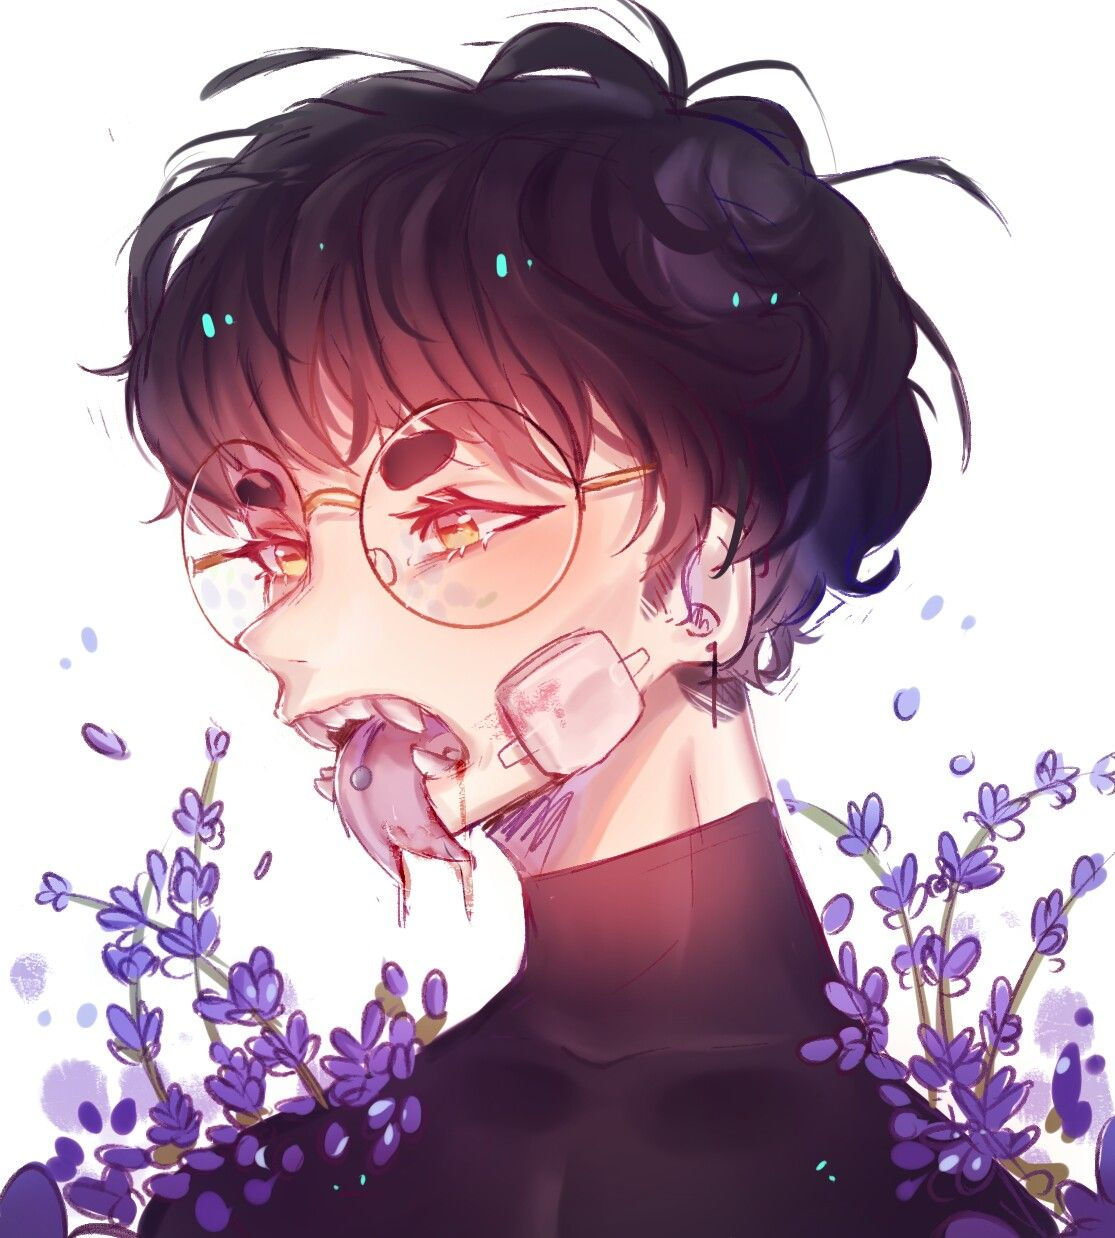 Aesthetic Anime Boy Pfp